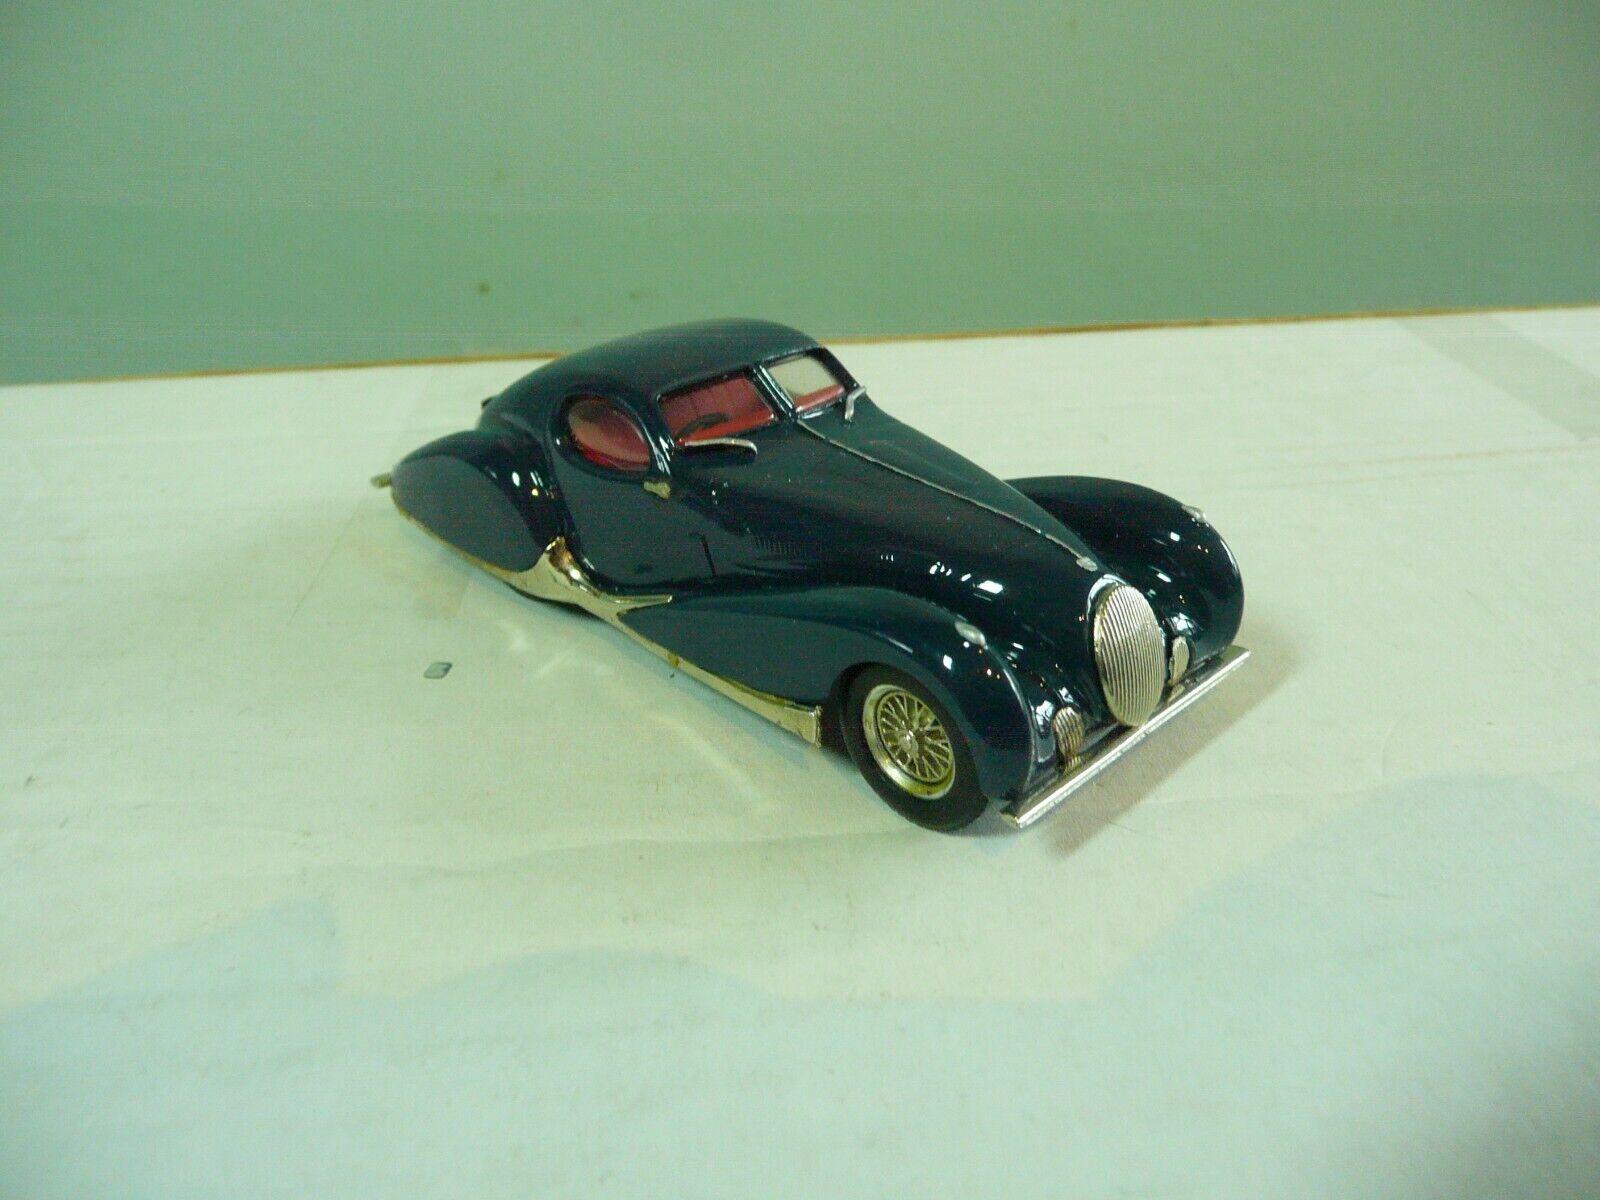 70% de descuento Western Models Models Models WMS21 1938 Talbot Lago - 1 43  los clientes primero